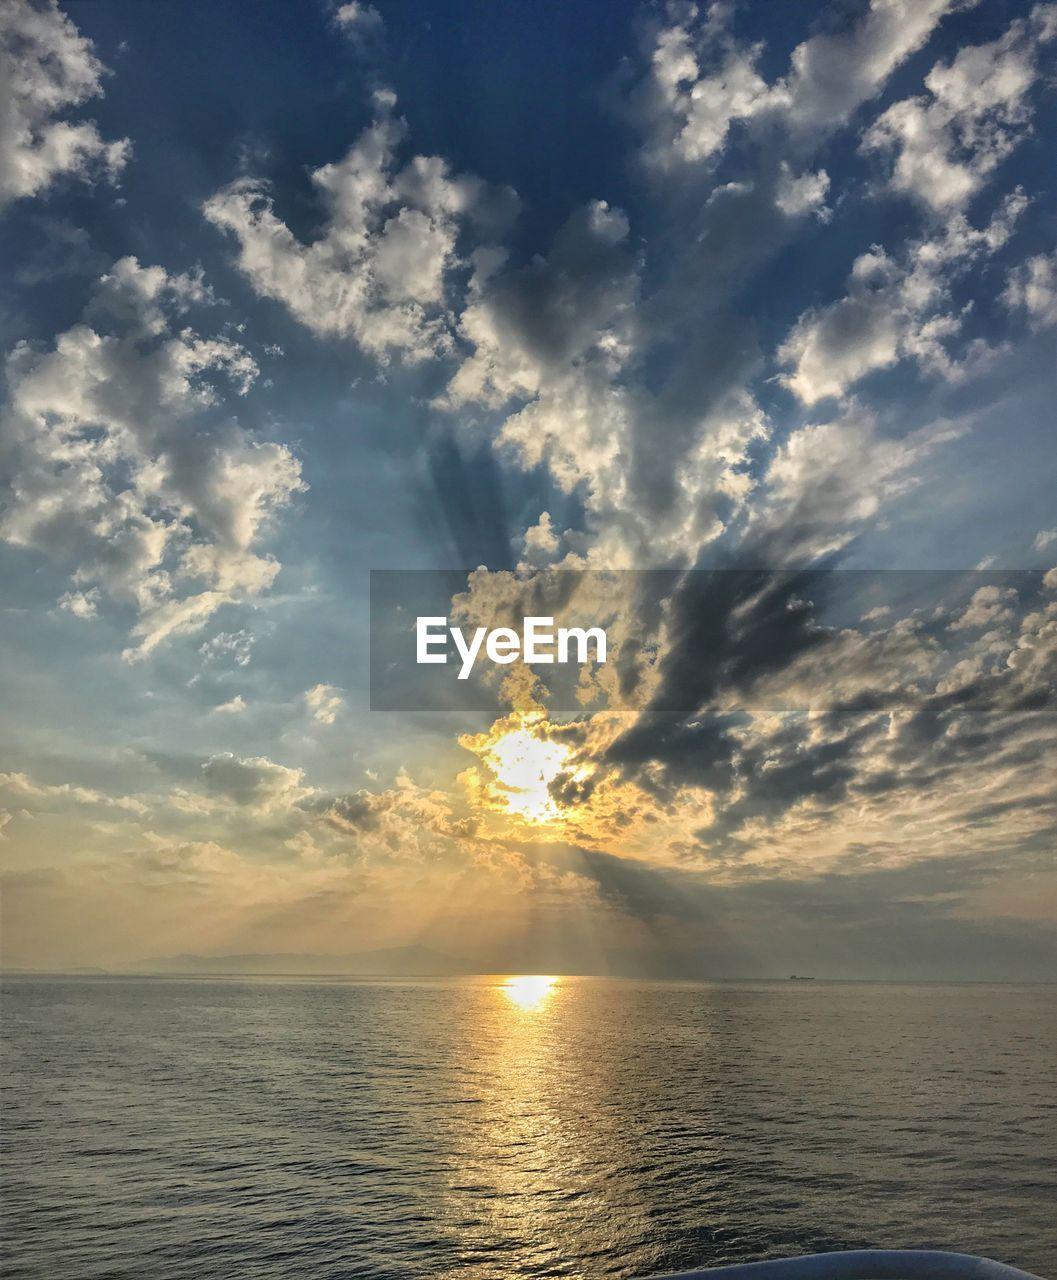 sky, cloud - sky, water, horizon, sea, horizon over water, beauty in nature, sunset, scenics - nature, tranquility, tranquil scene, waterfront, nature, sunlight, idyllic, sun, seascape, no people, sunbeam, outdoors, bright